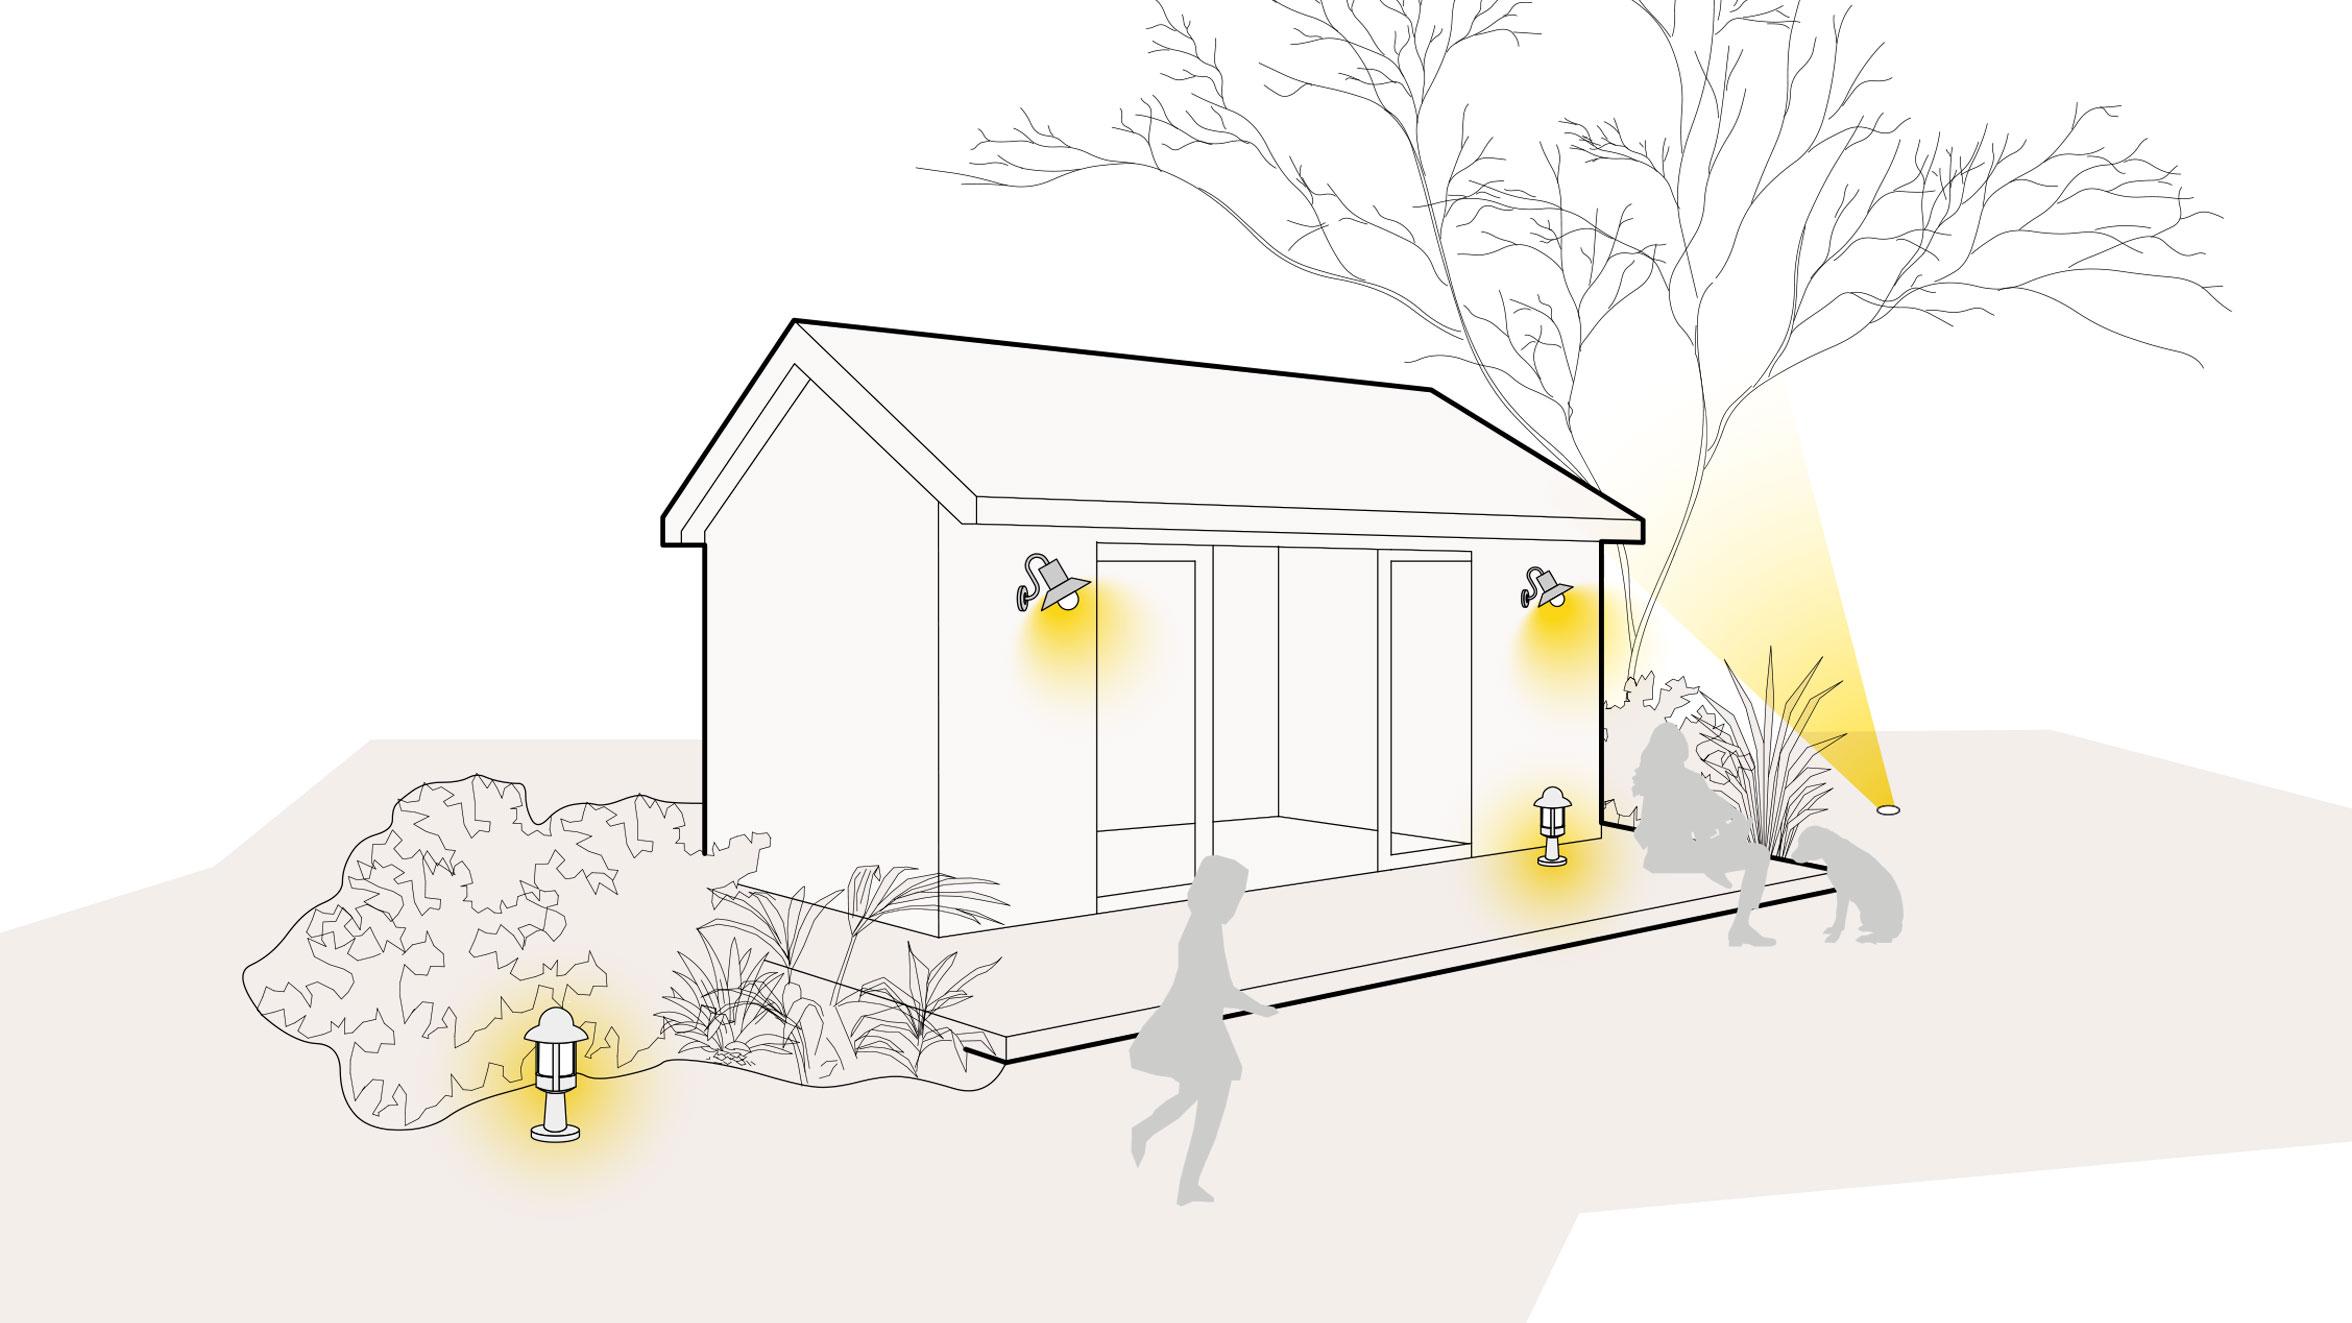 Lichtszene Gartenhäuschen